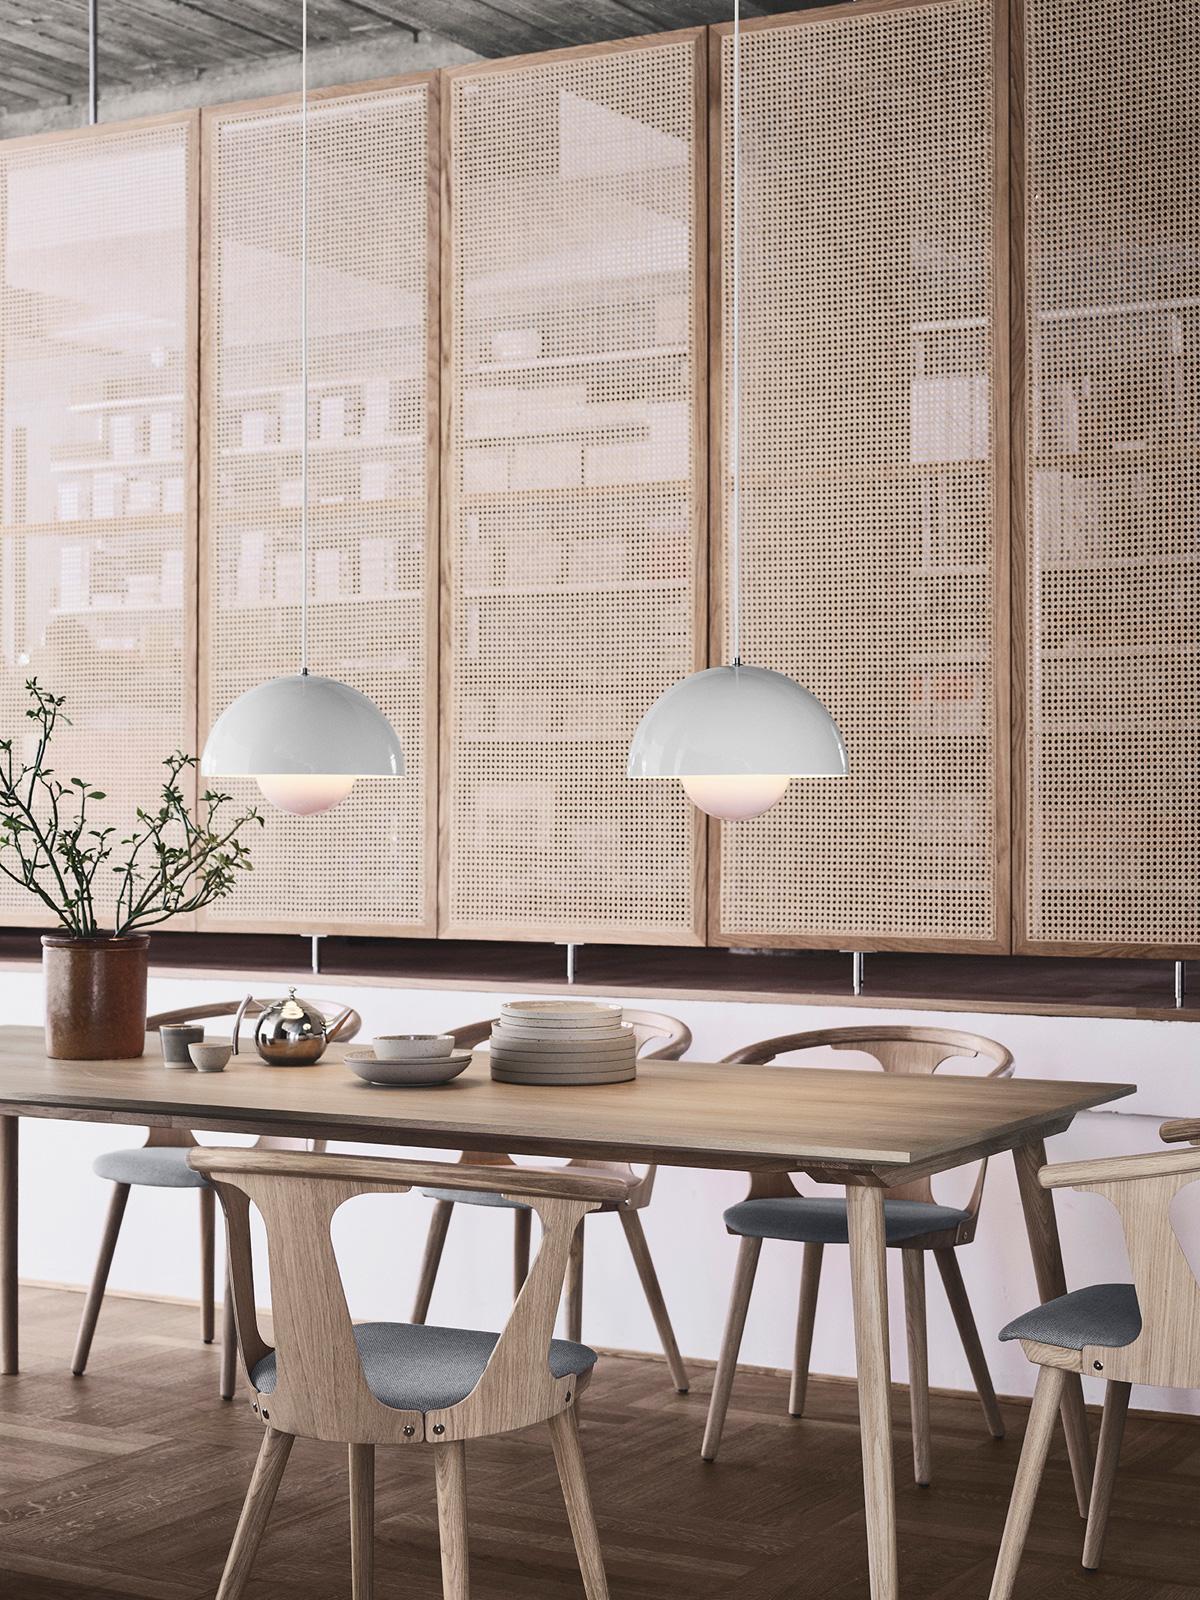 Big Flowerpot VP7 &tradition Leuchte Verner Panton skandinavisch DesignOrt Onlineshop Berlin